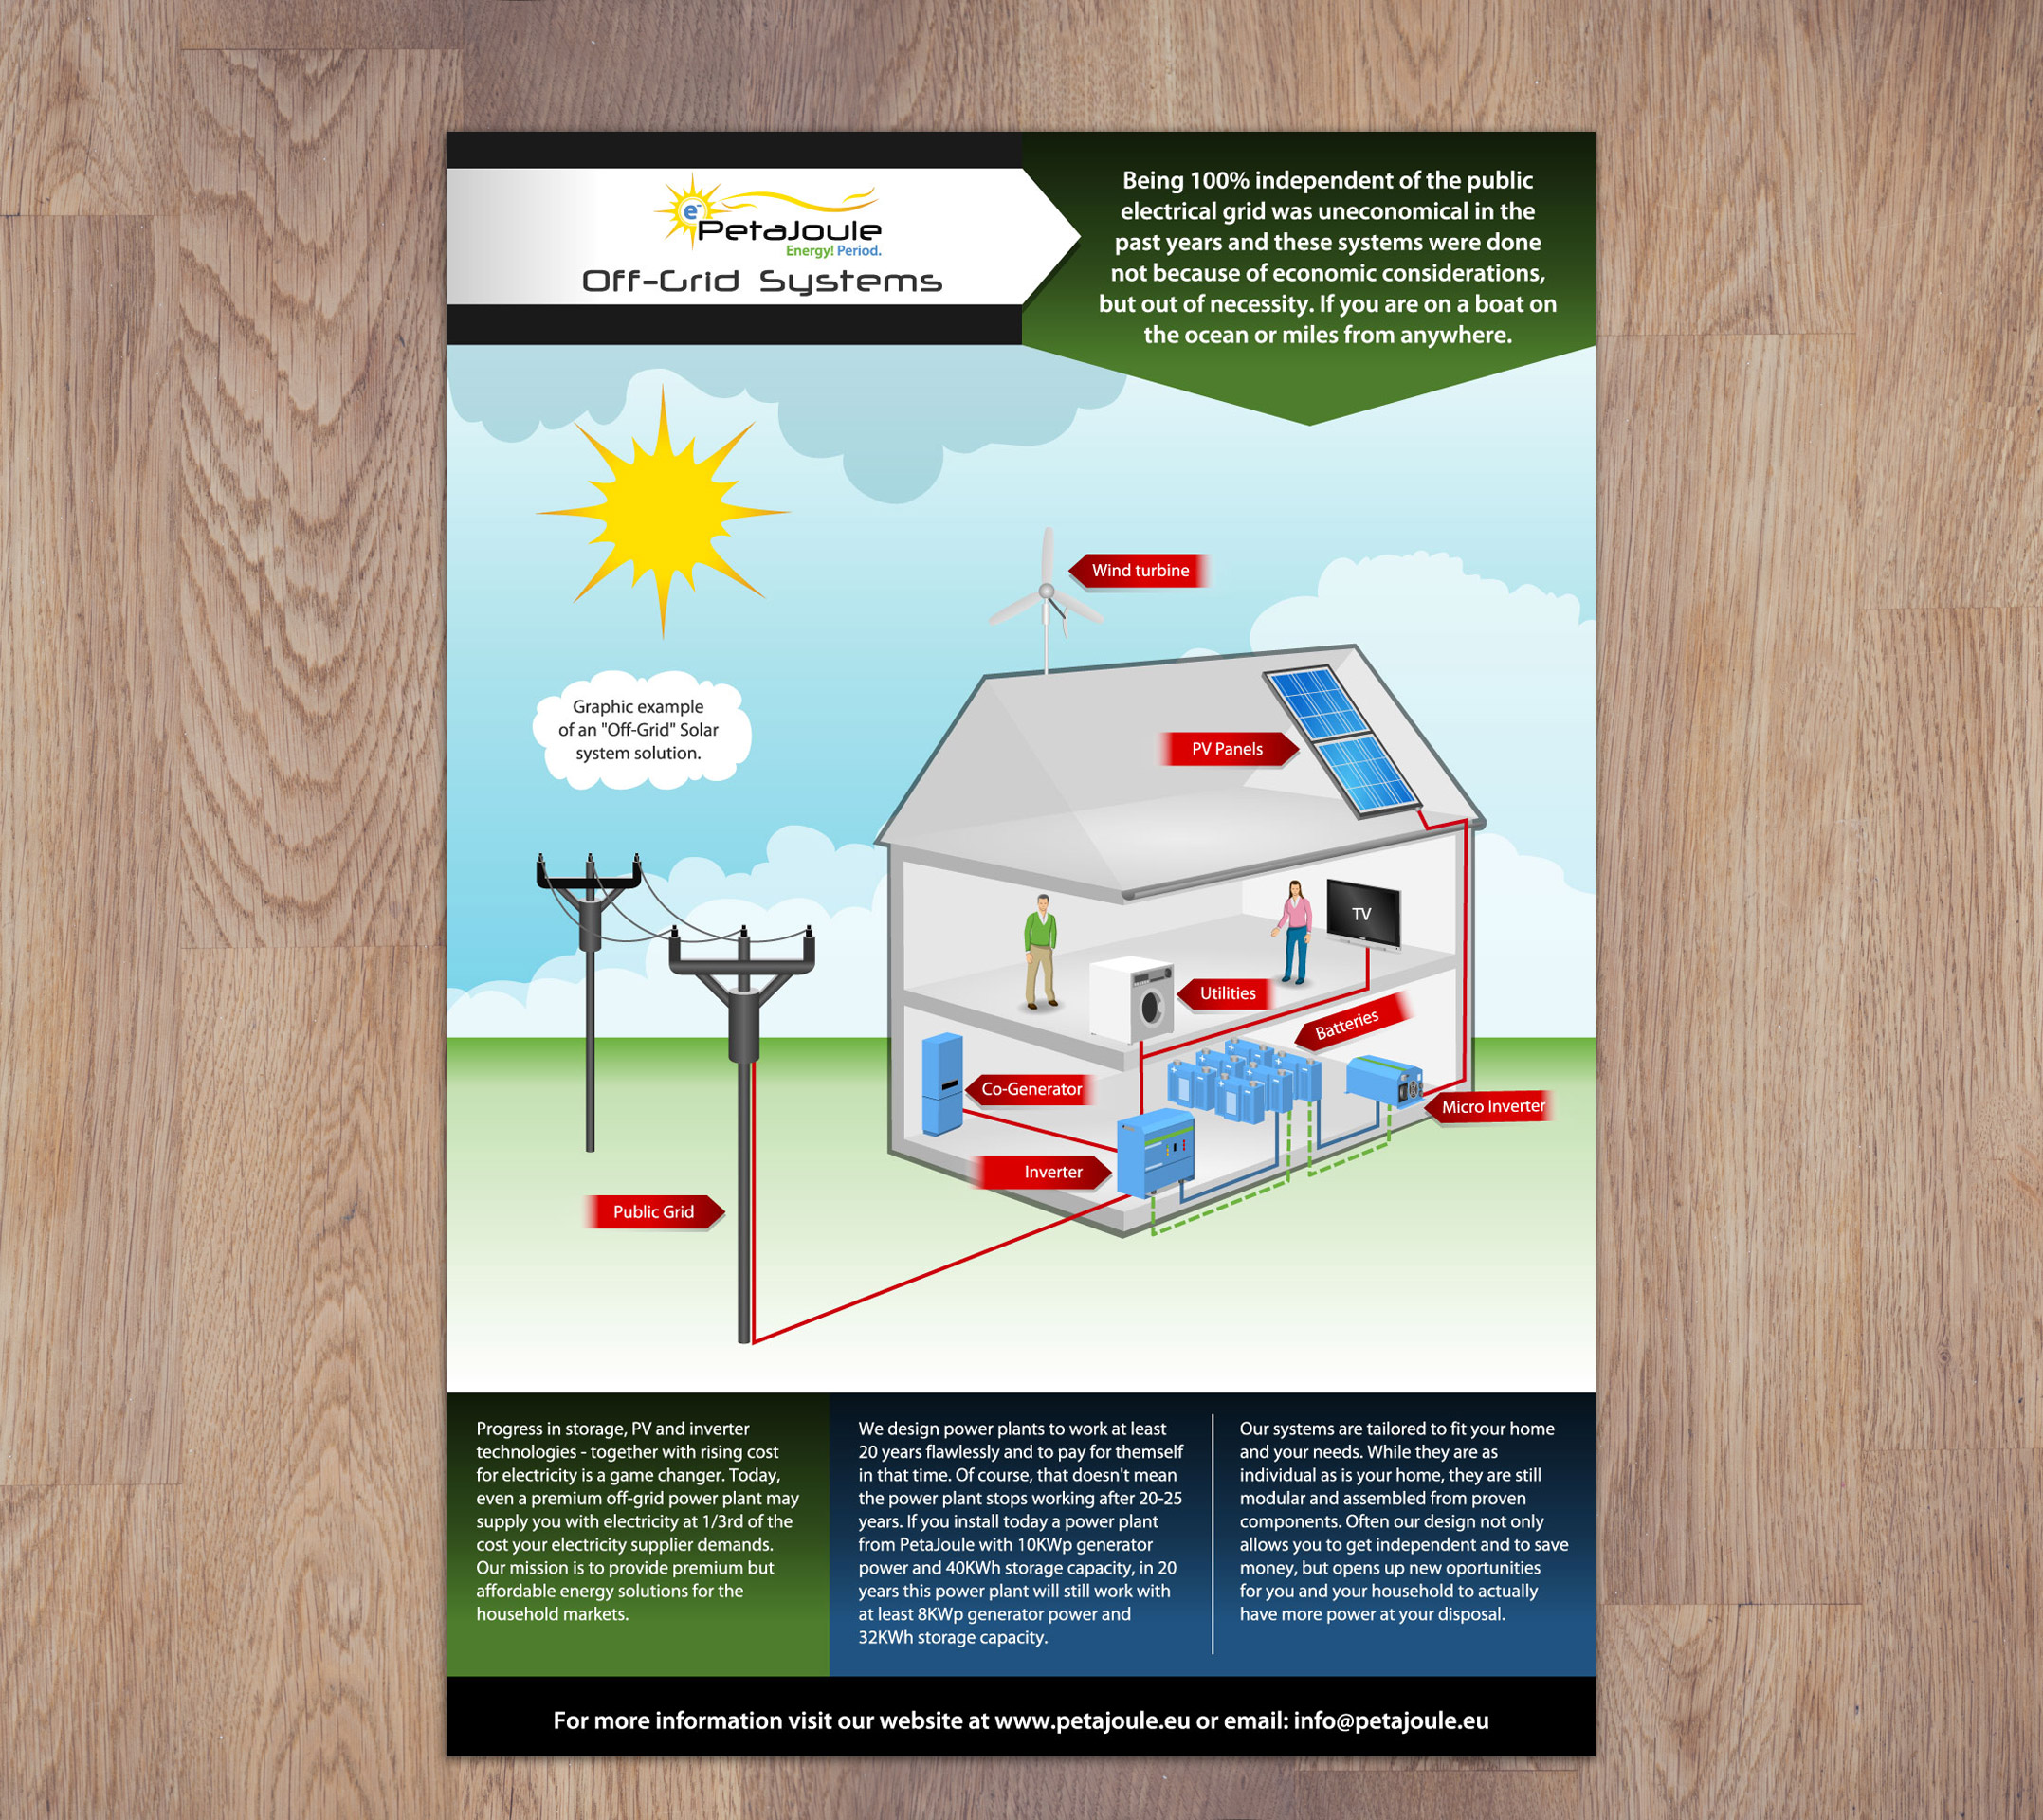 Petajoule A4 infographic